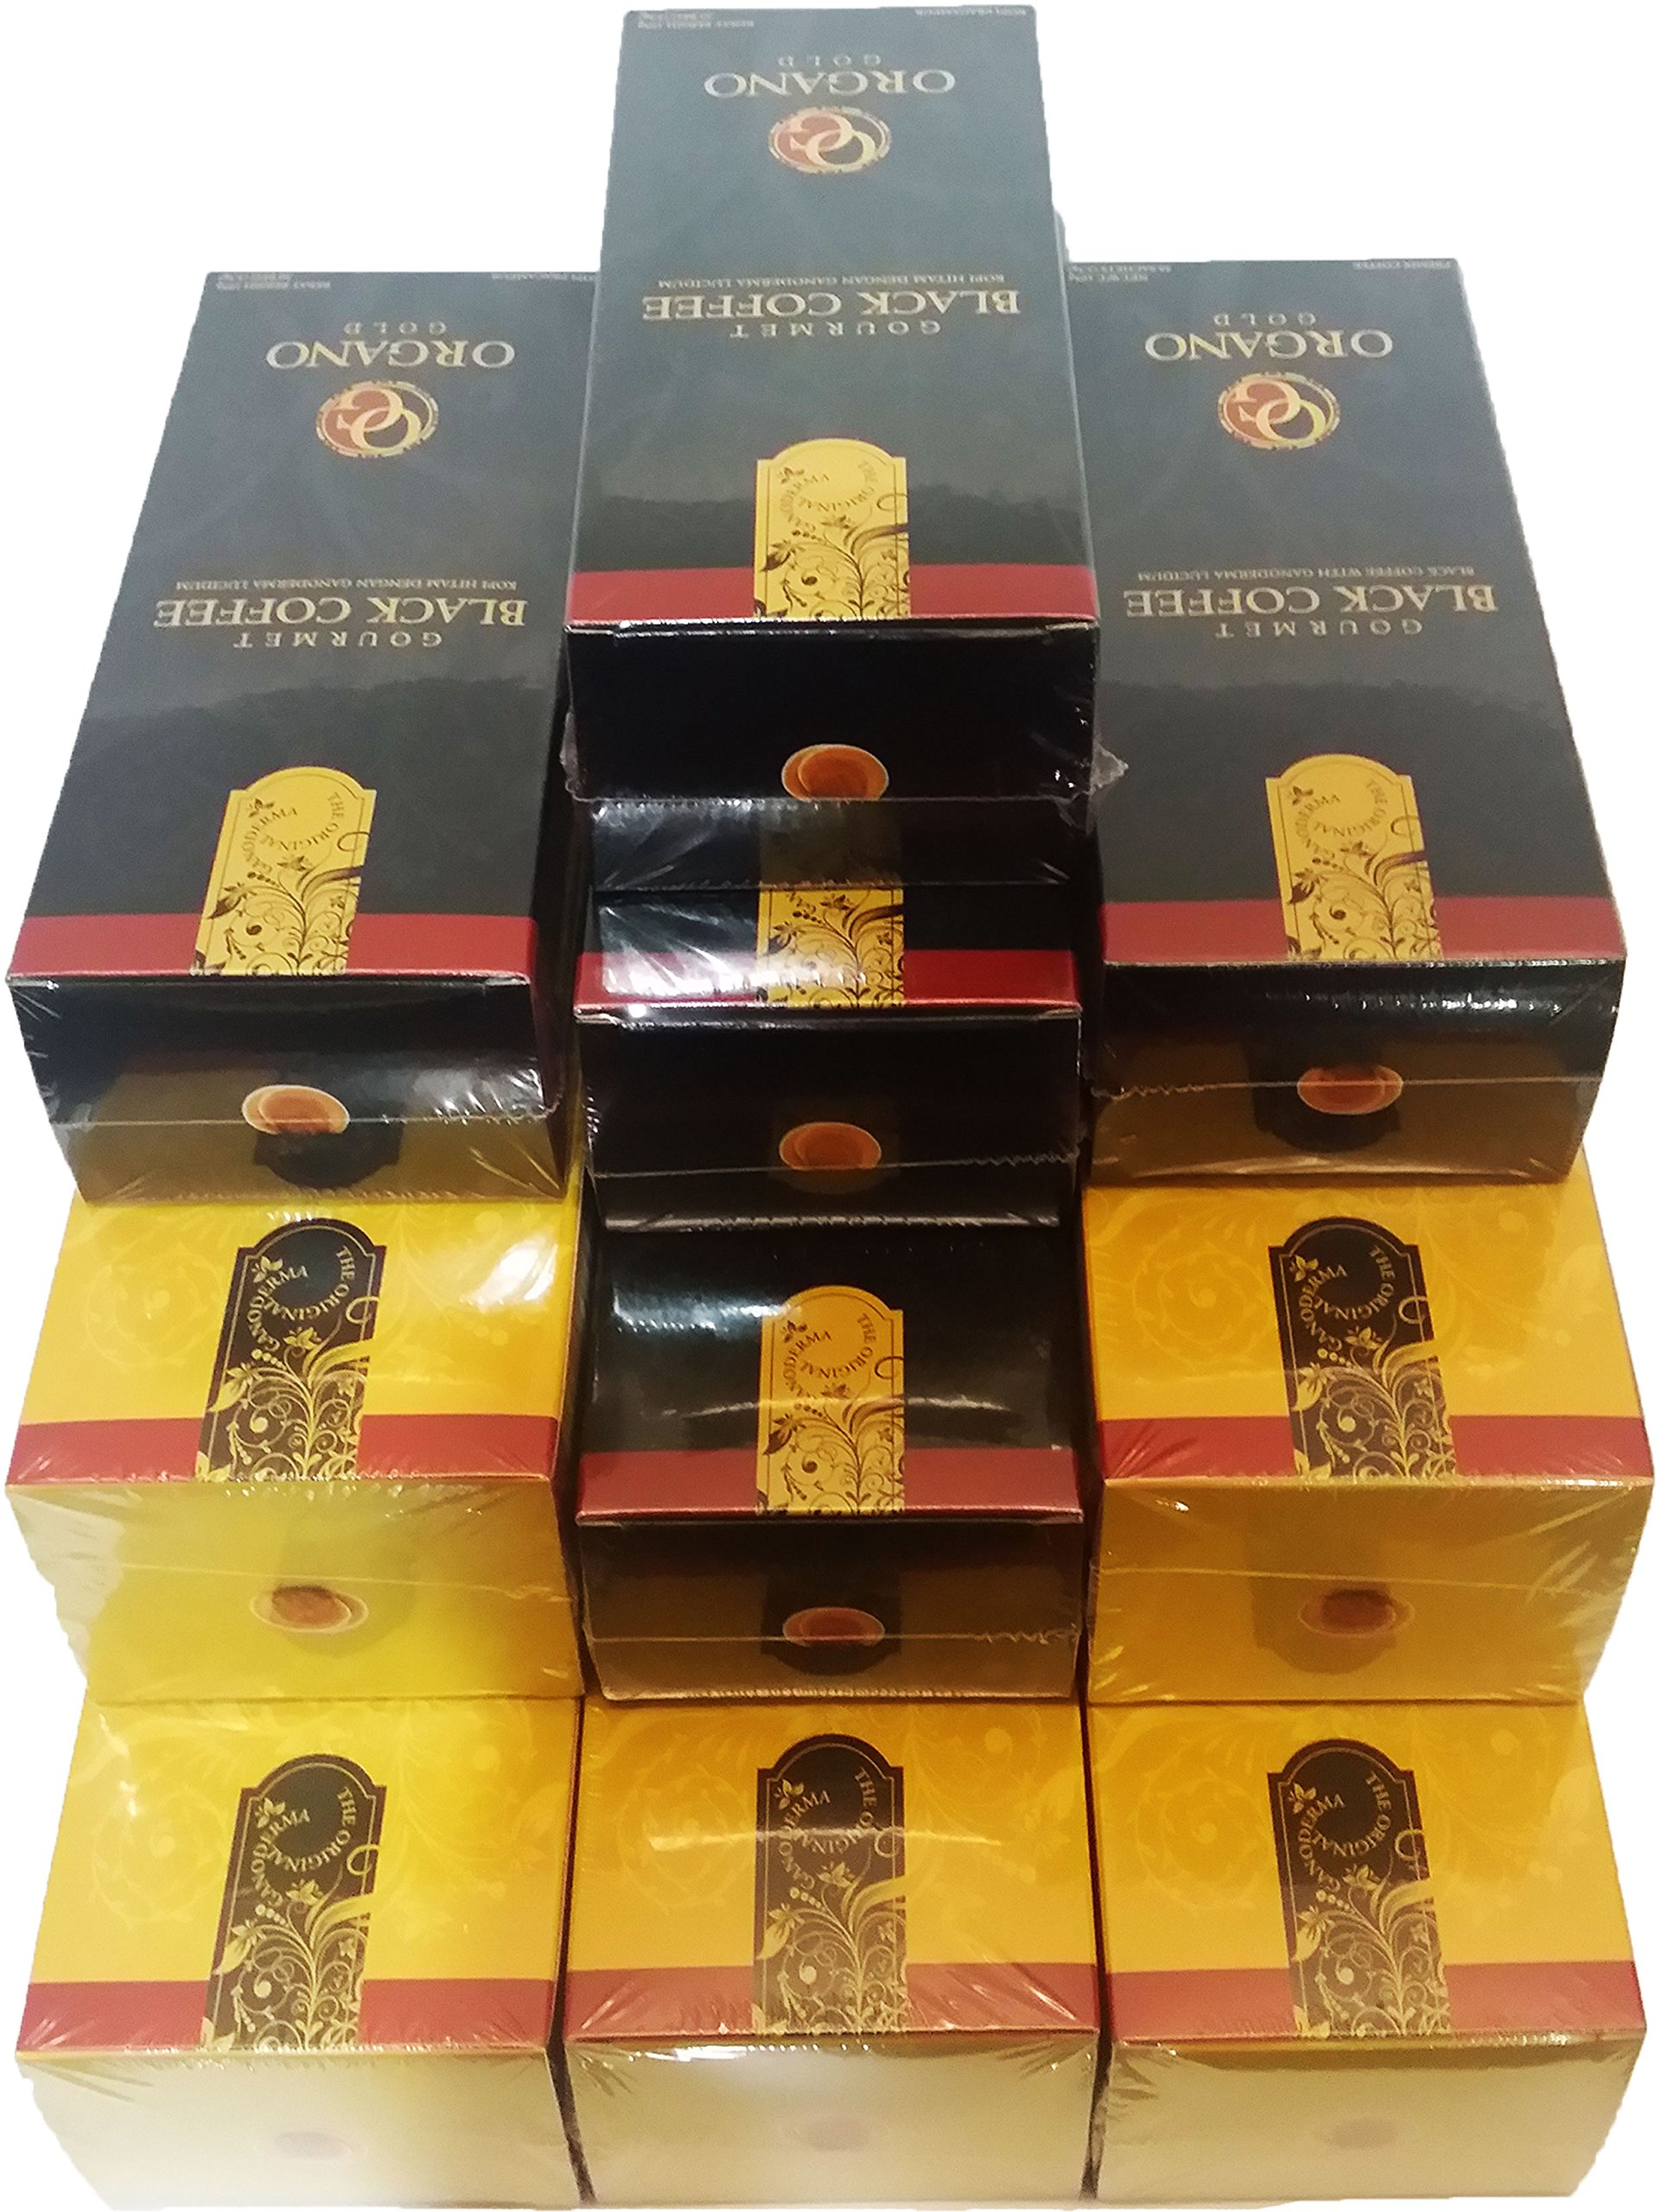 Mix Pack-10 Organo Gold (5) Gourmet Black Coffee + (5) Gourmet Cafe Latte with 100% Organic Ganoderma Lucidum Extract - HOS